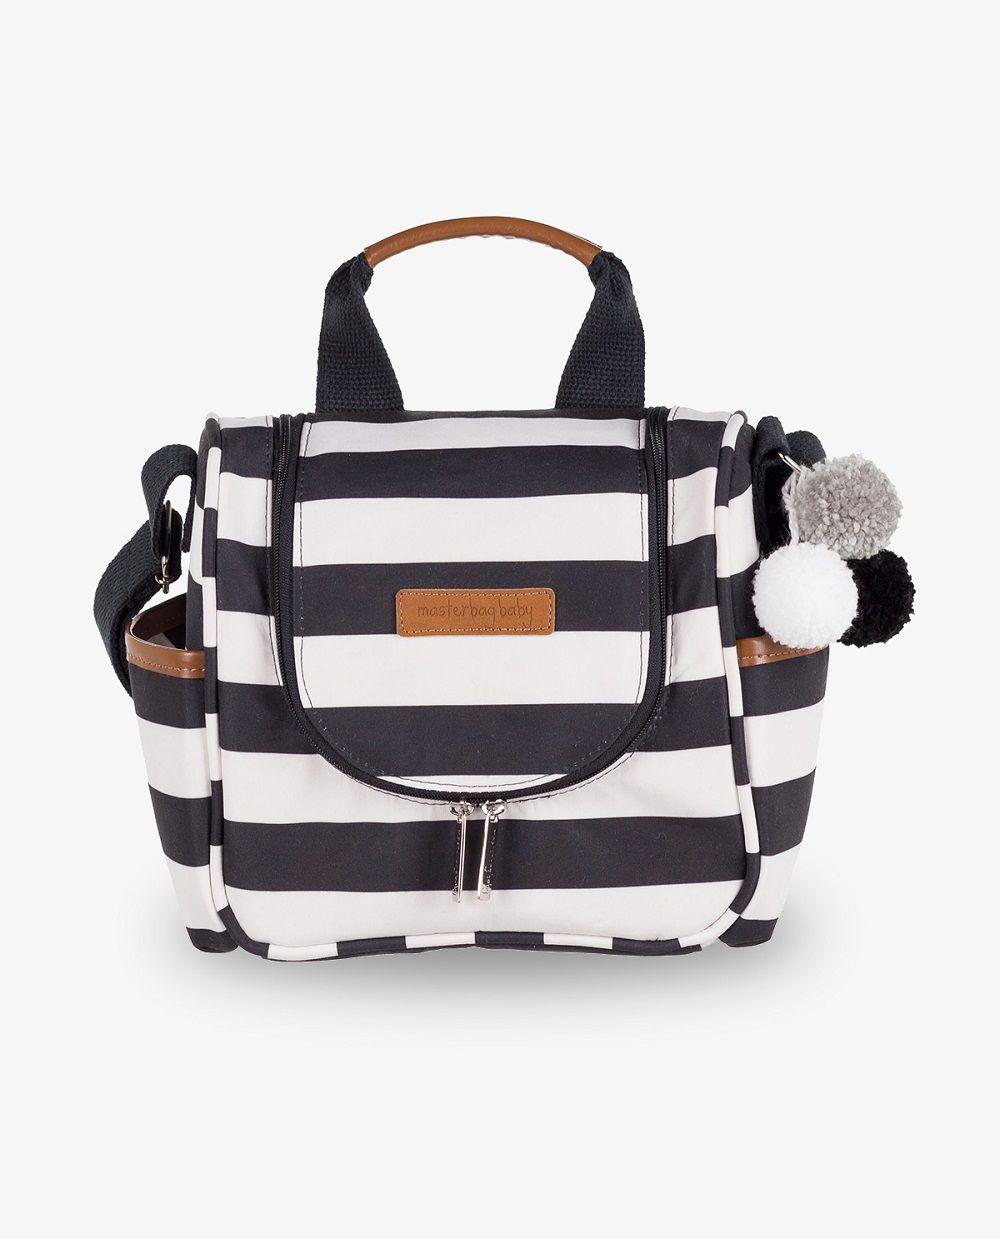 Frasqueira maternidade térmica Emy Preta e branca Brooklin - Masterbag Baby